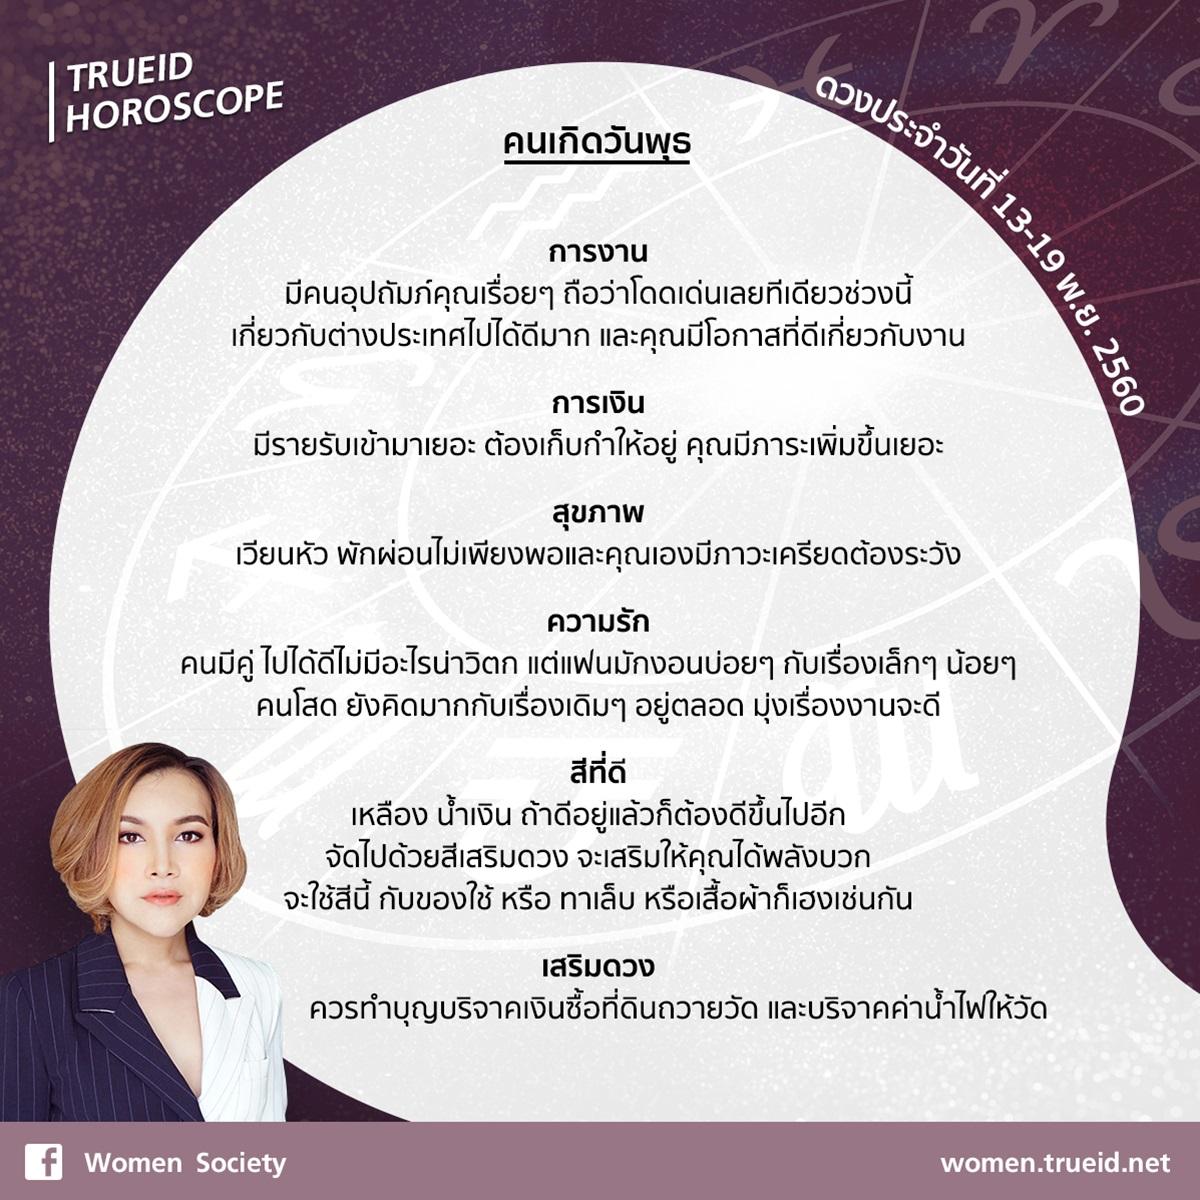 TrueID Horoscope : ดูดวง รายสัปดาห์ แม่นๆ 13-19 พ.ย. 60 โดย หมอดู Toktak A4